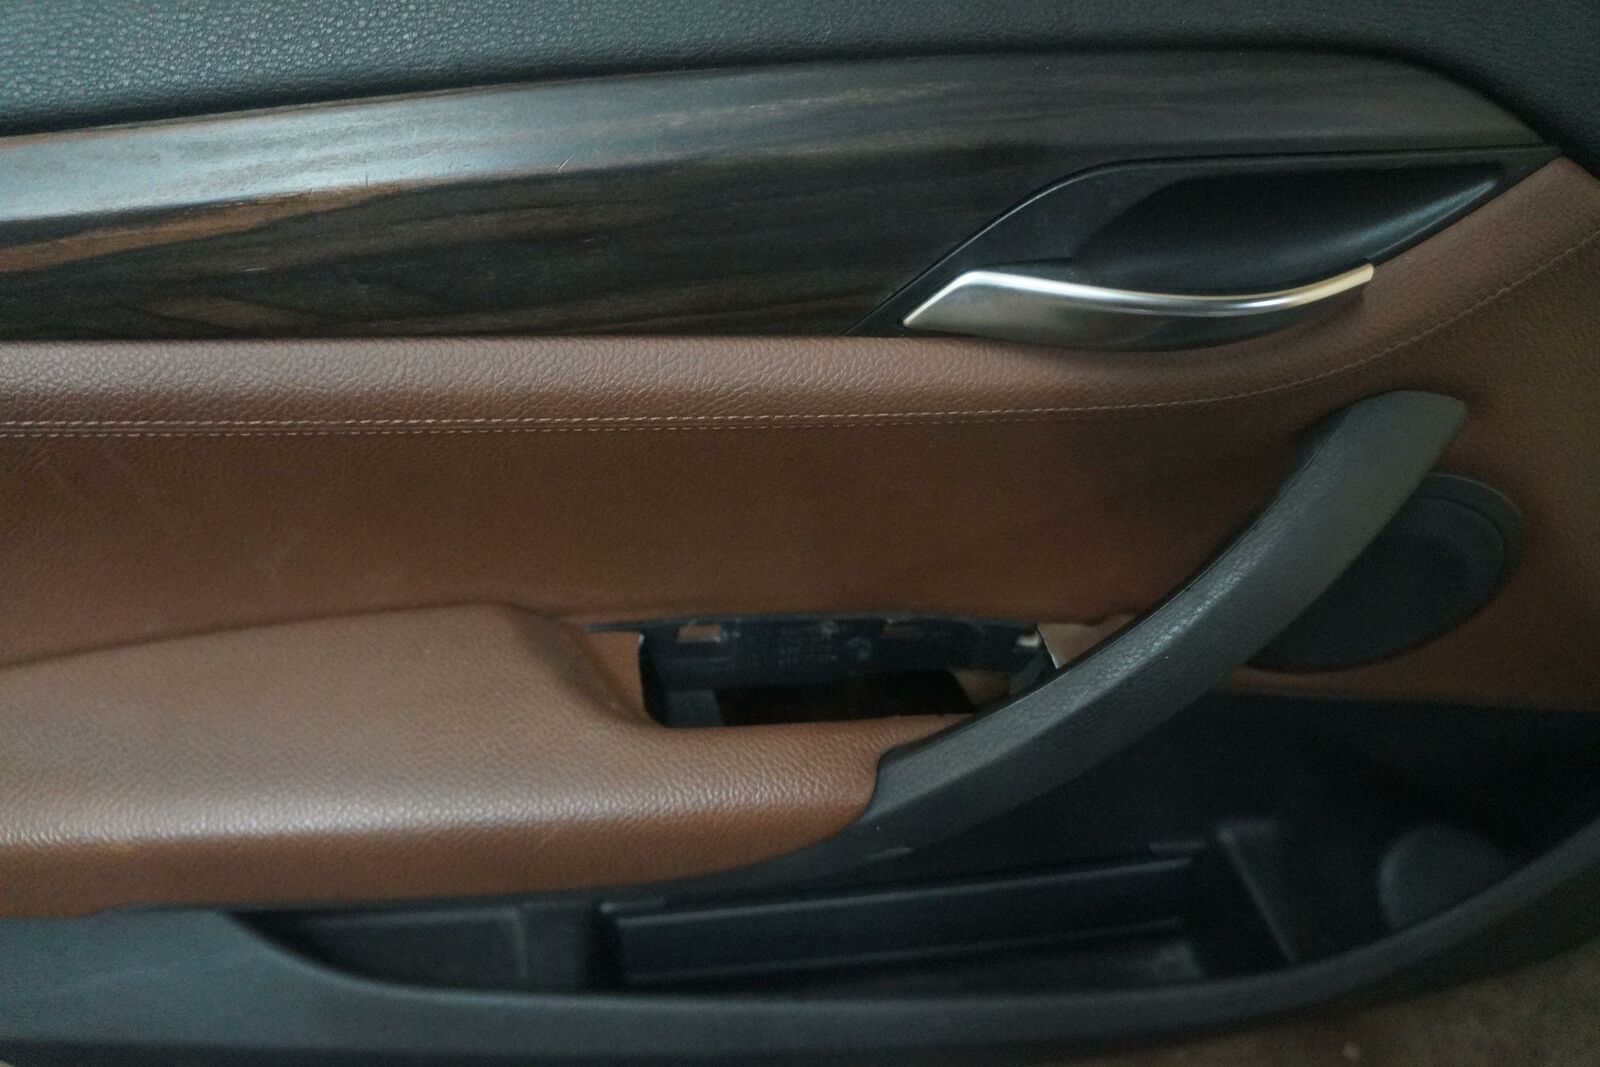 Set 4 Front Rear Interior Door Trim Panel Terra Black Oem Bmw X1 E84 2013 15 Pacific Motors